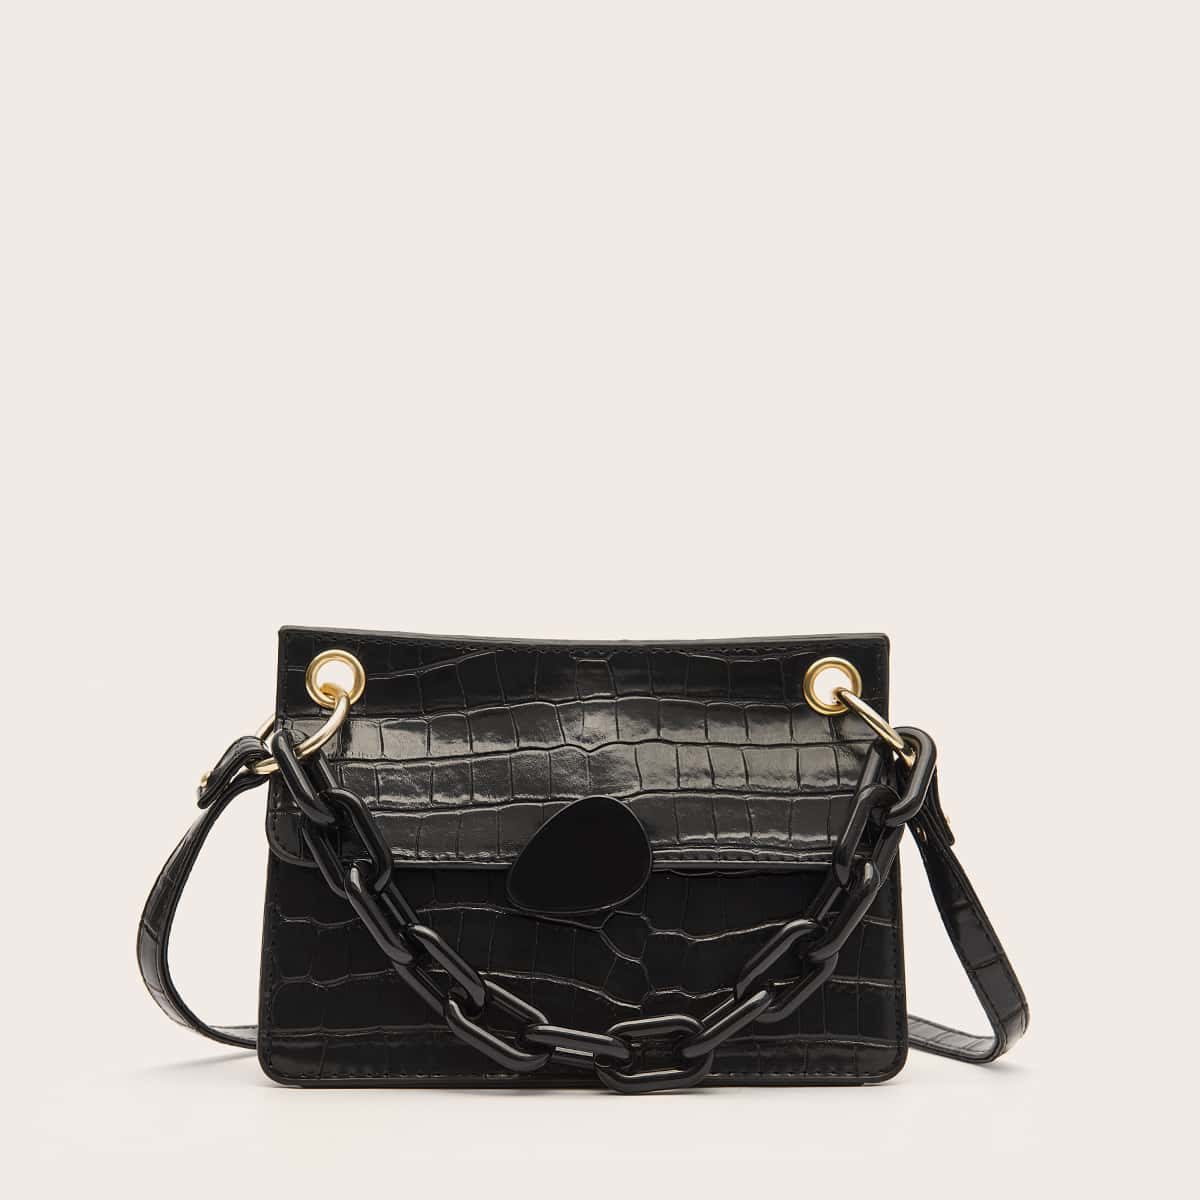 SHEIN / Chain Decor Croc Embossed Satchel Bag